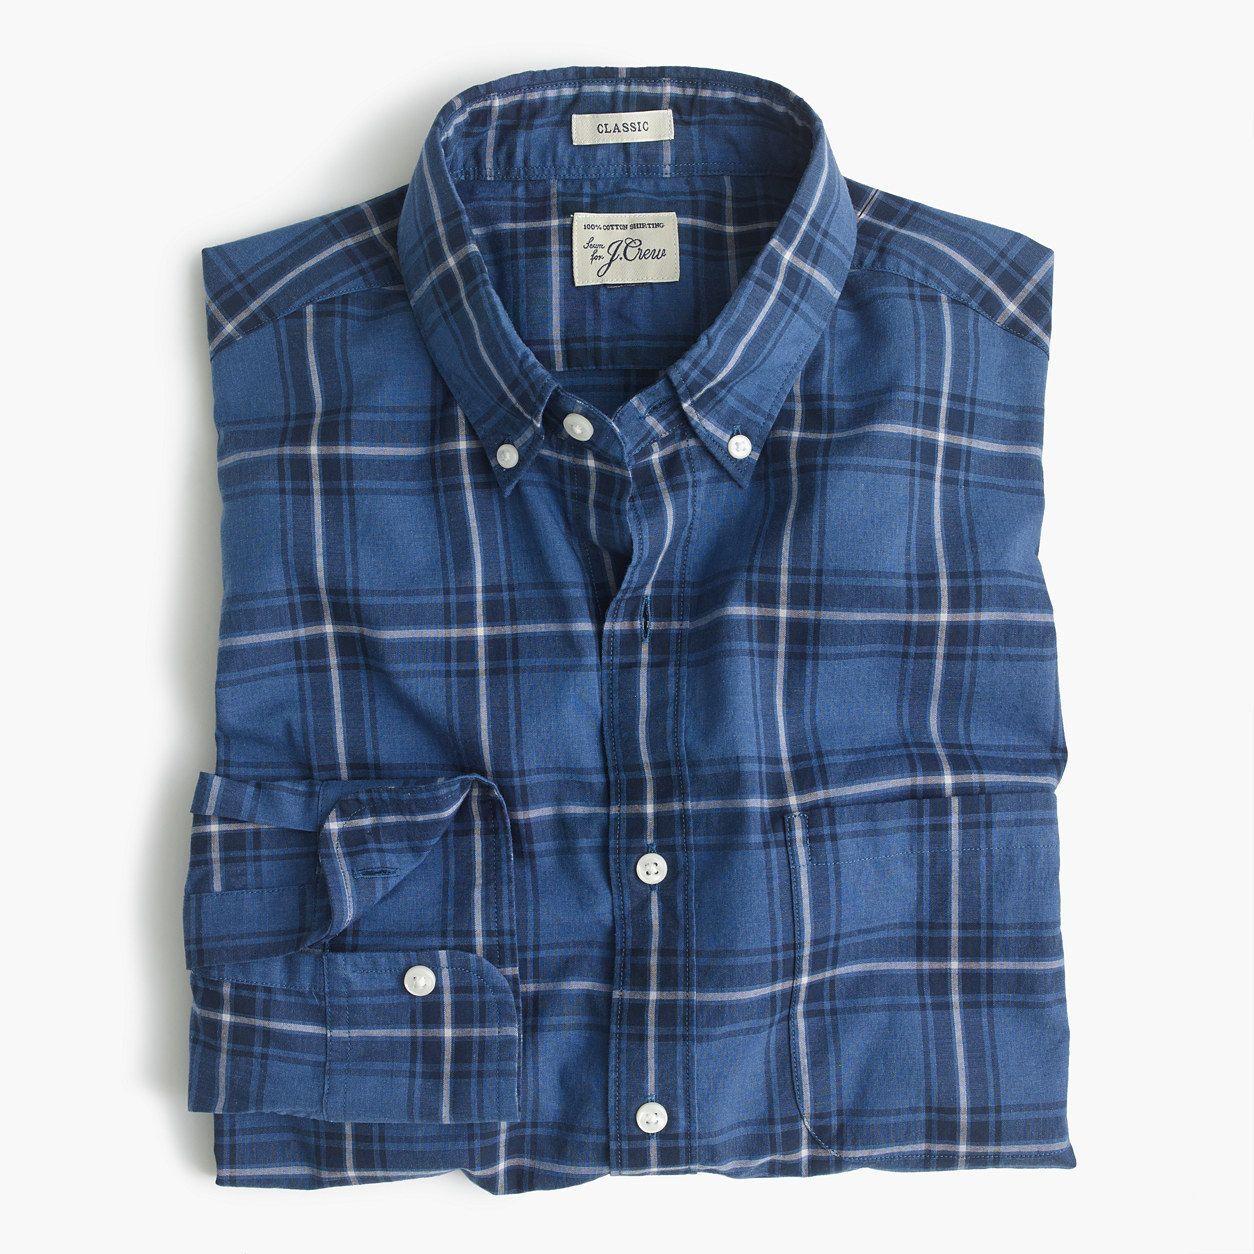 Flannel shirt xs  JCrew Mens Secret Wash Shirt In Navy Plaid Heather Poplin Size XS